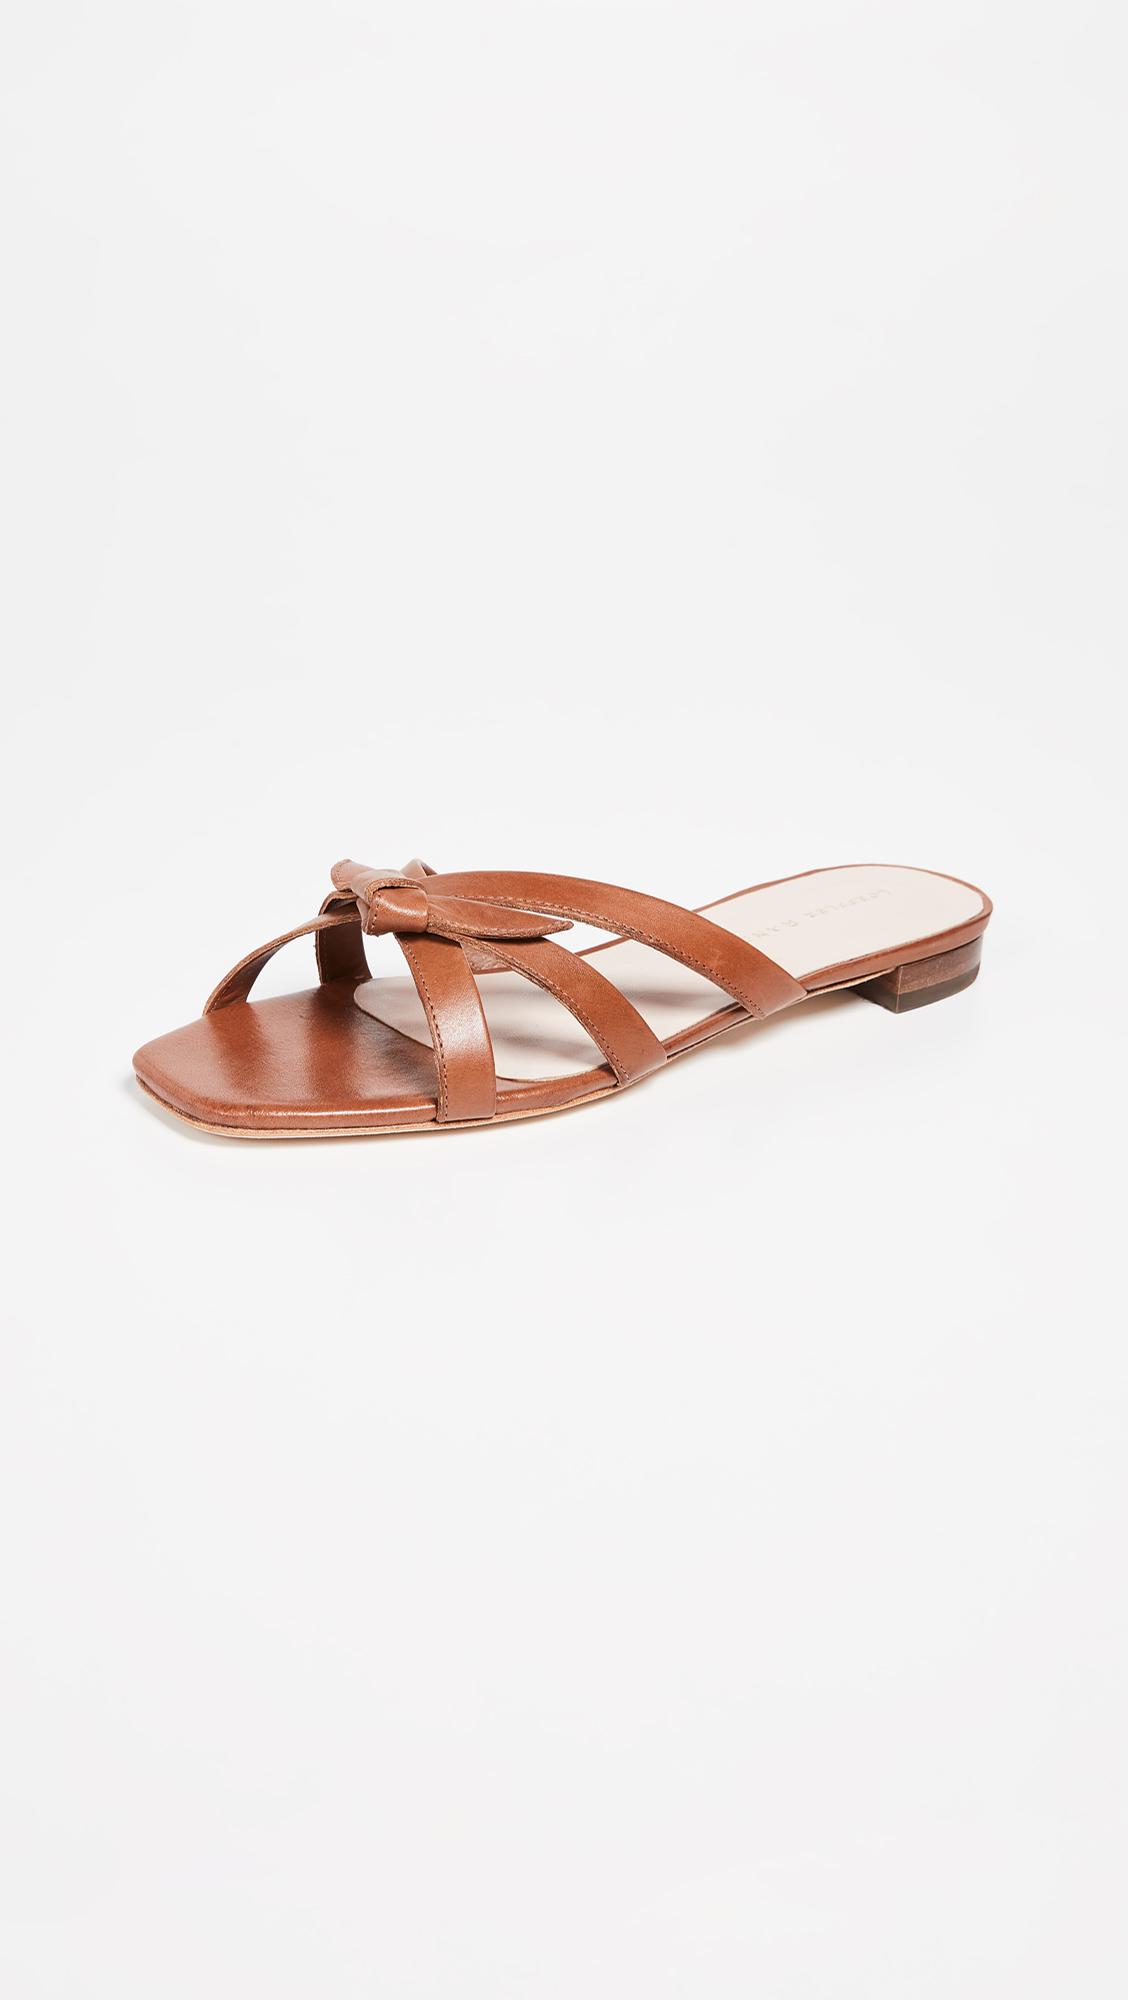 c86dea9a49bf6 Loeffler Randall Eveline Delicate Strap Flat Sandals